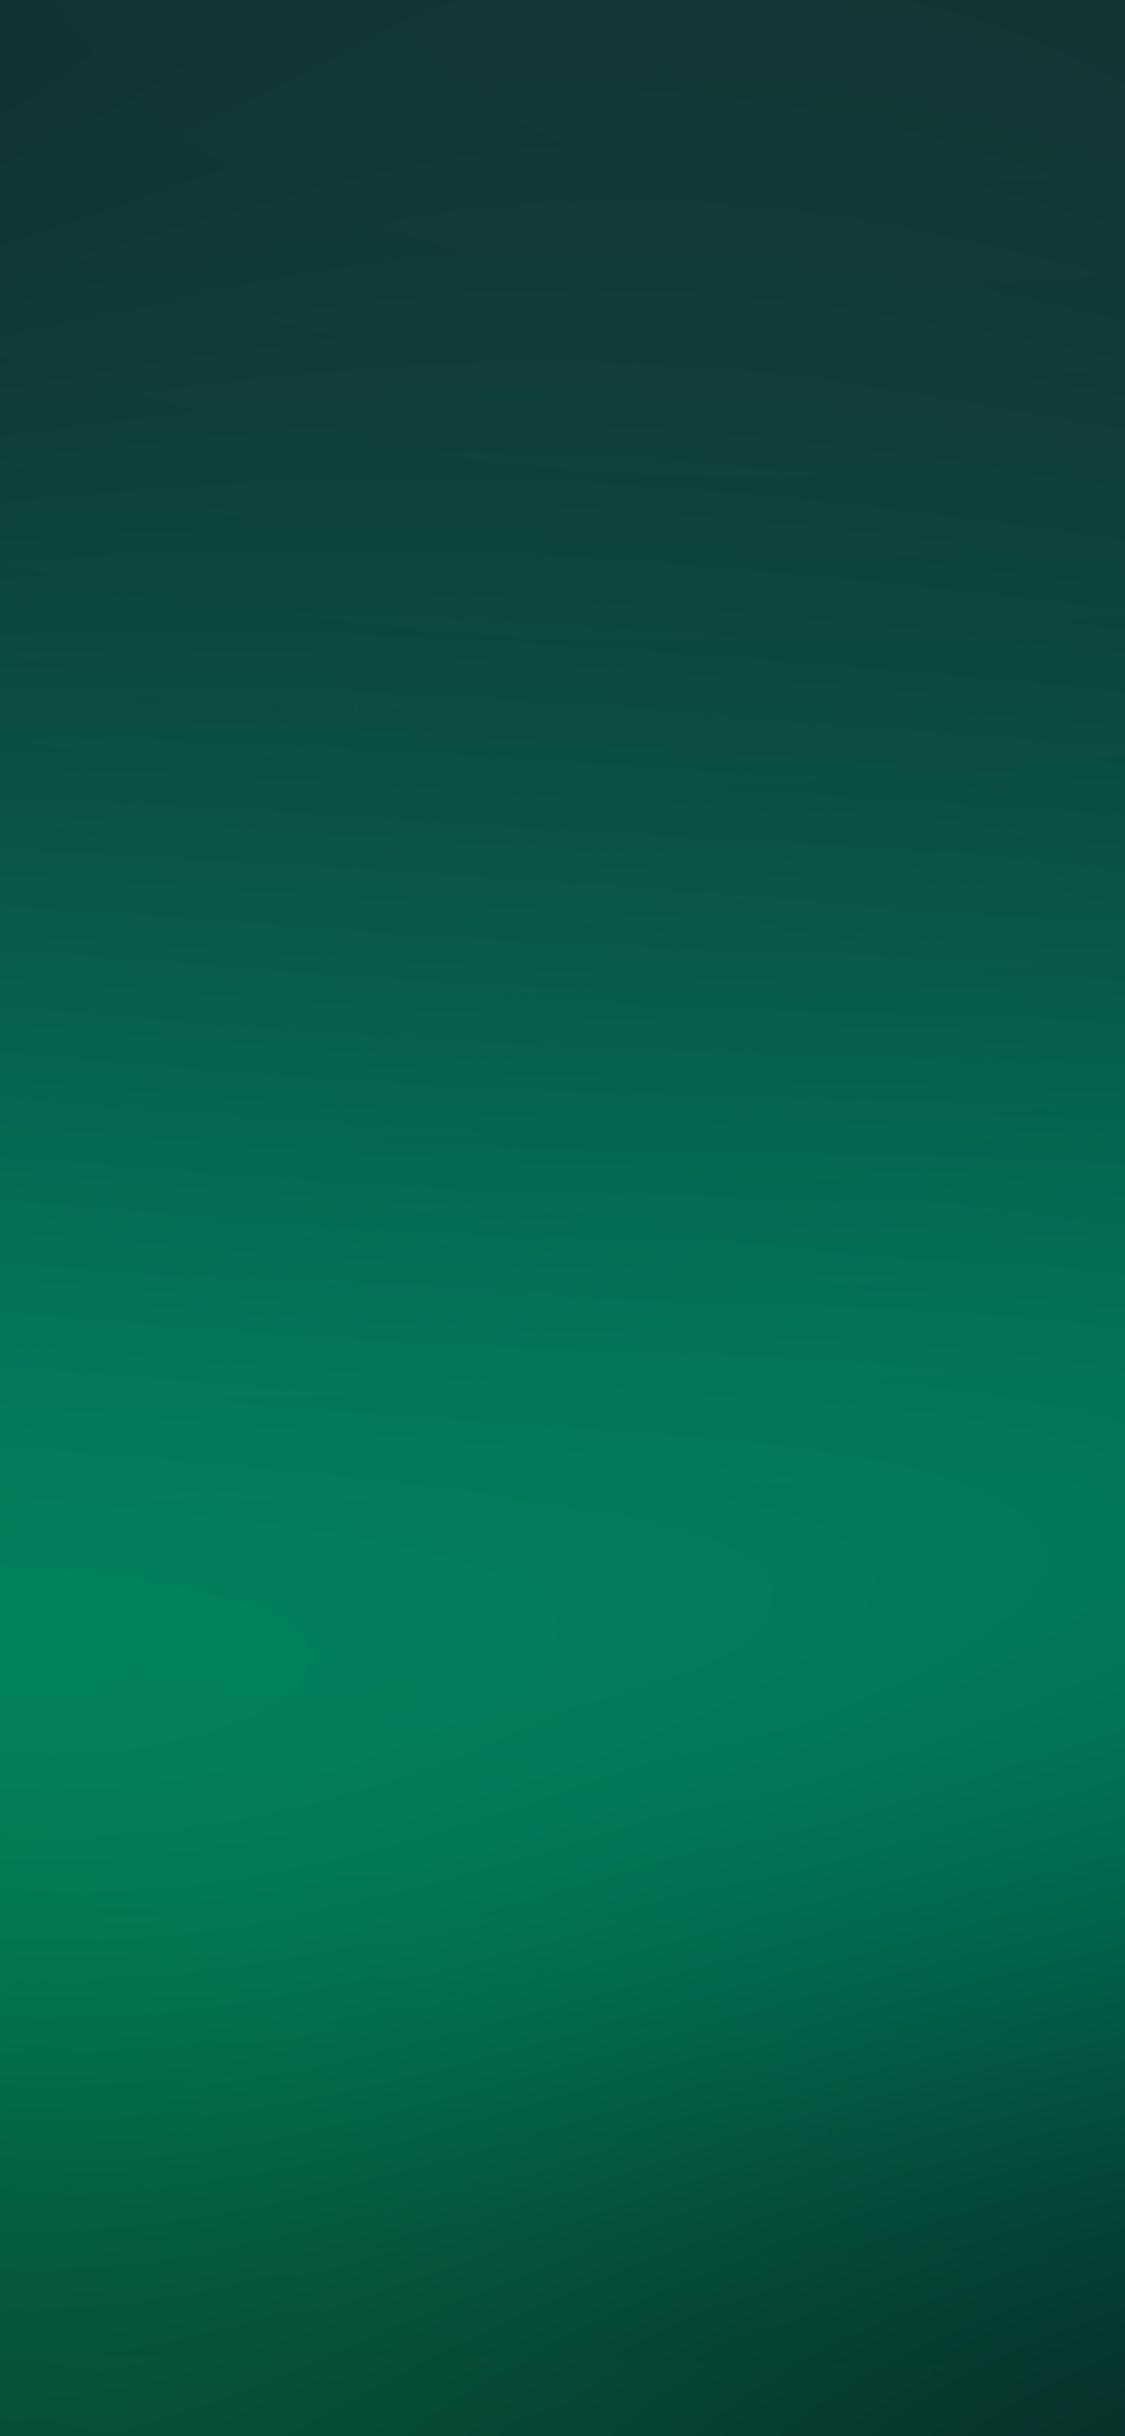 iPhoneXpapers.com-Apple-iPhone-wallpaper-sh04-green-light-gradation-blur